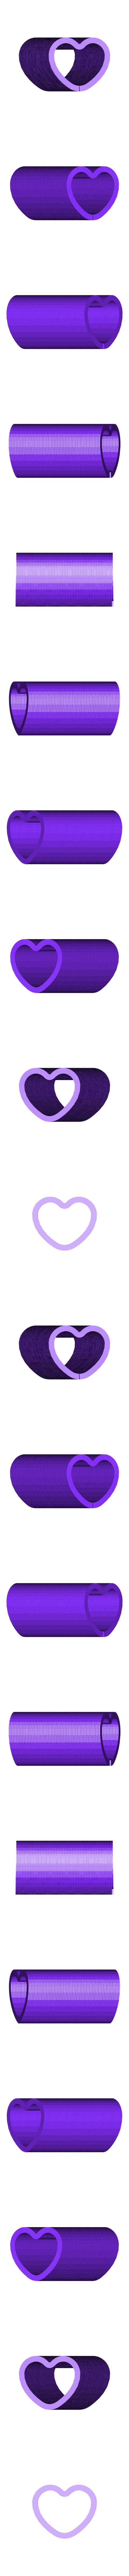 HeartSlinky.stl Download free STL file Slinkies • Template to 3D print, Ristrorg